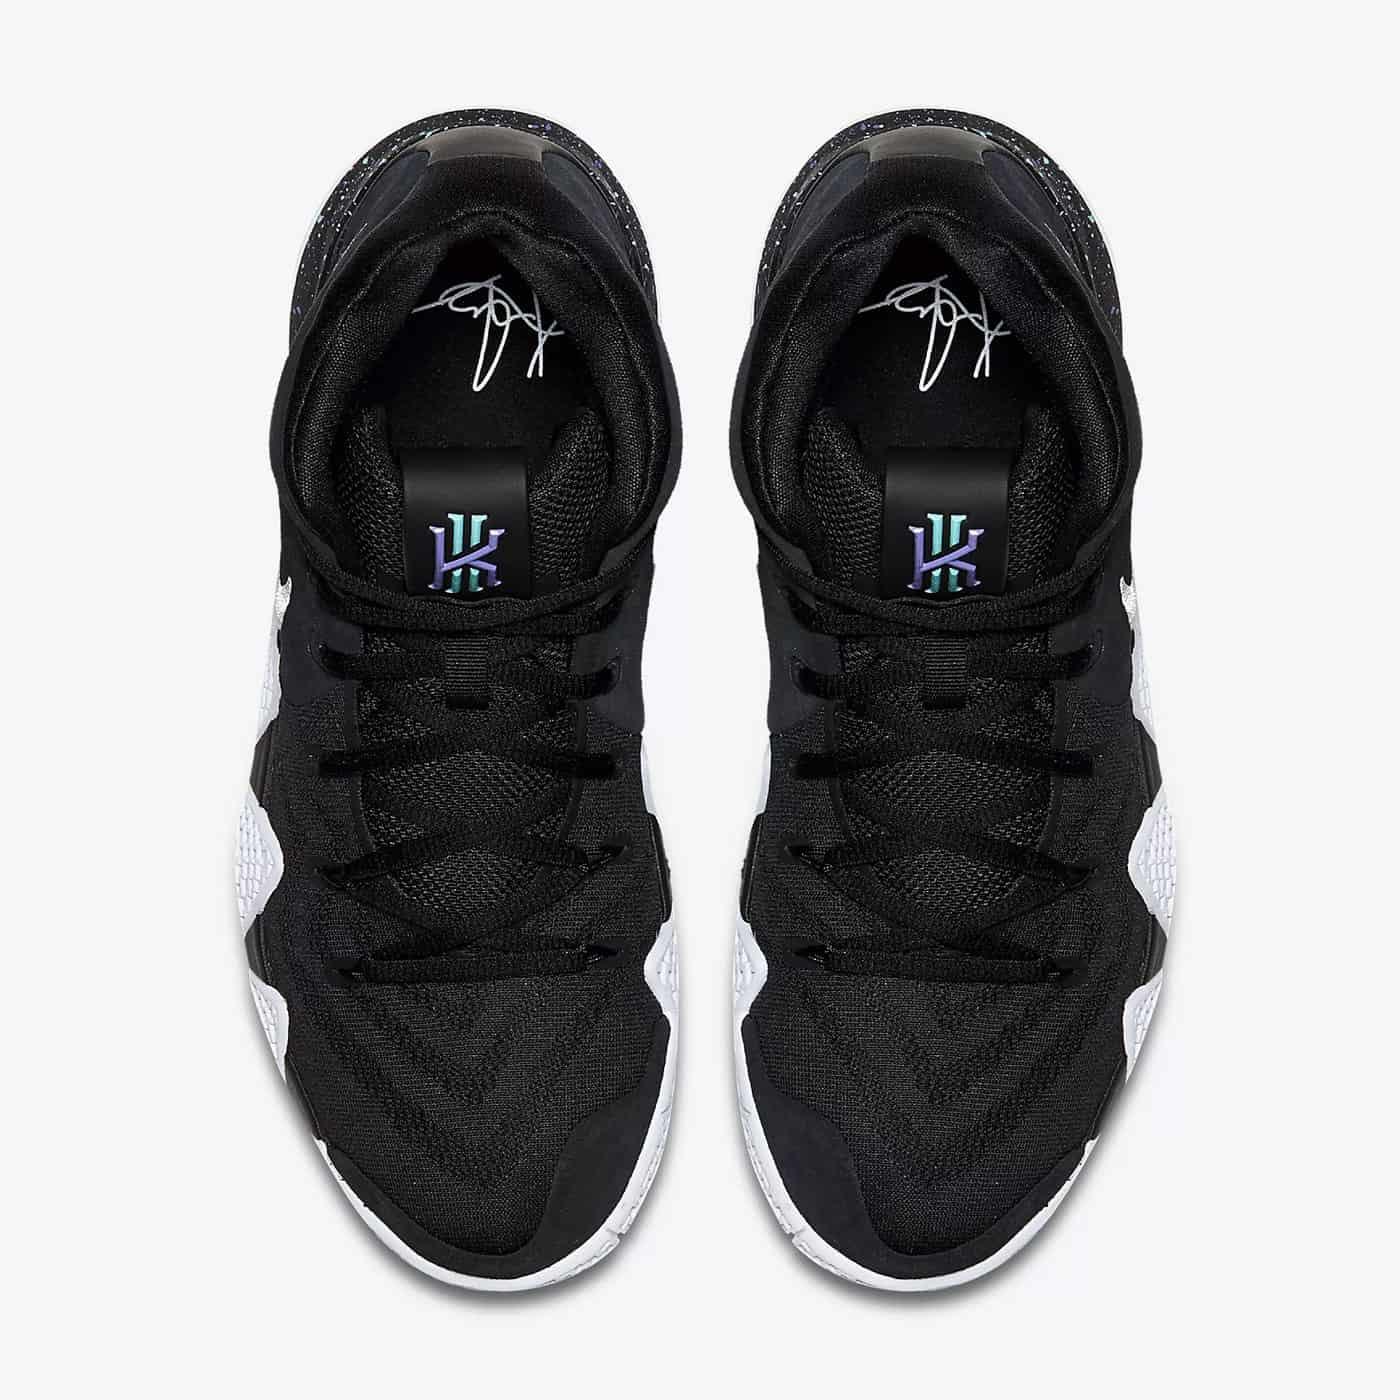 Grand Le Basketsession 4 De Sneakers Nike Test Kyrie q8tSRS